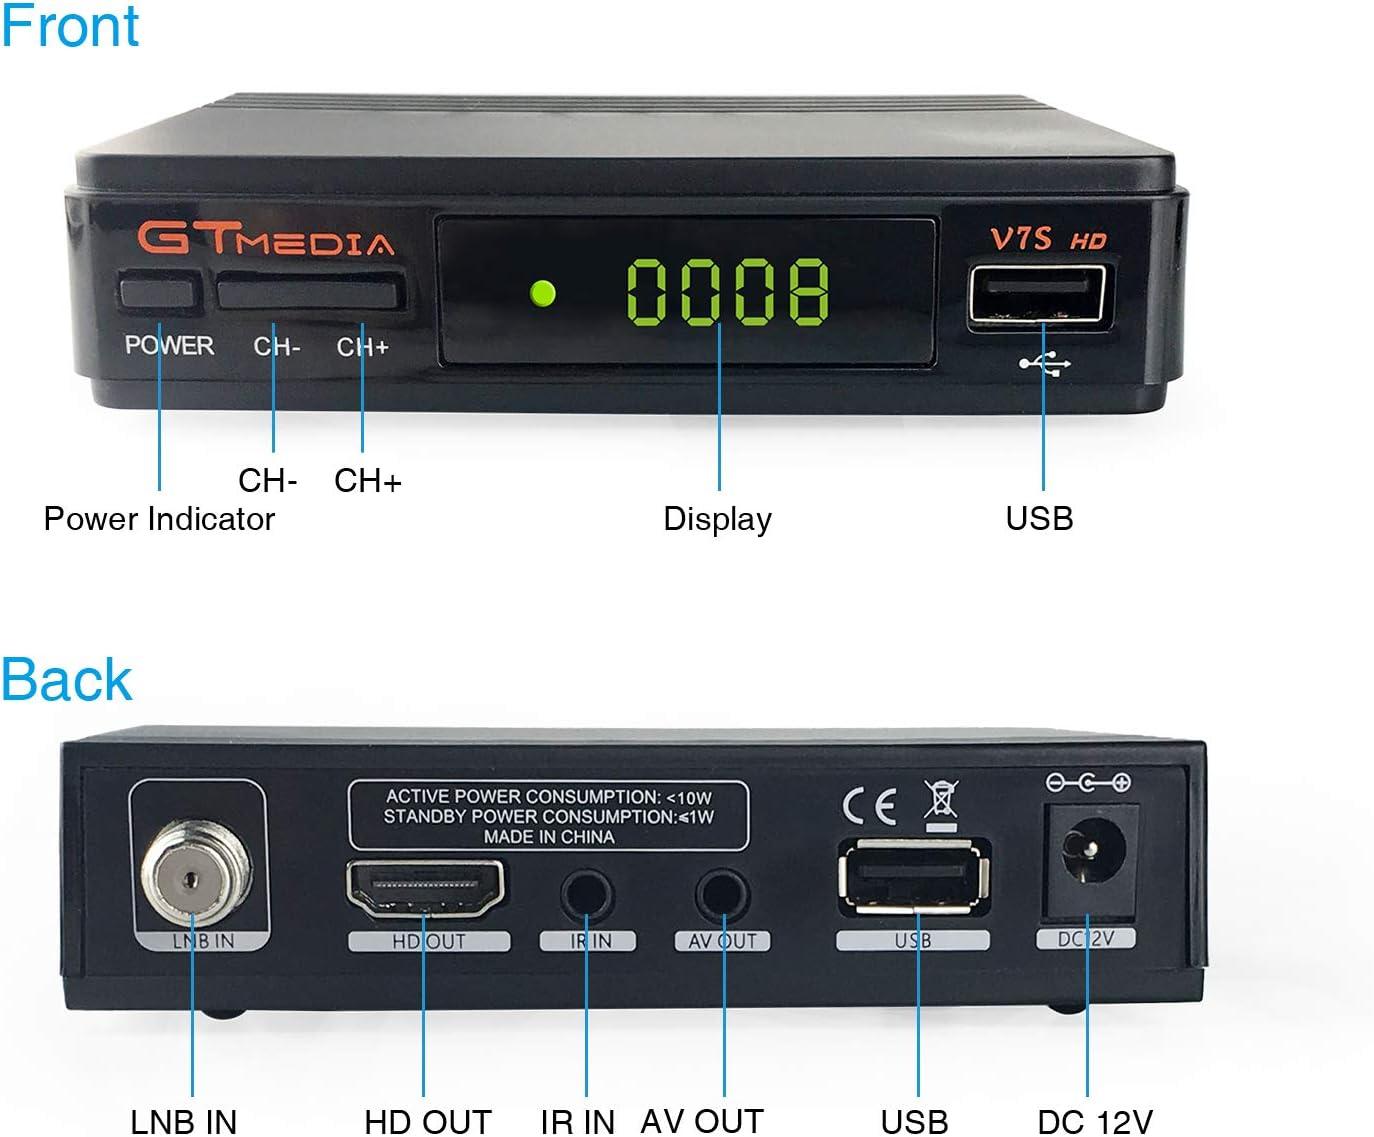 GT MEDIA V7S HD Receptor Satélite DVB-S/S2 Decodificador de TV por ...